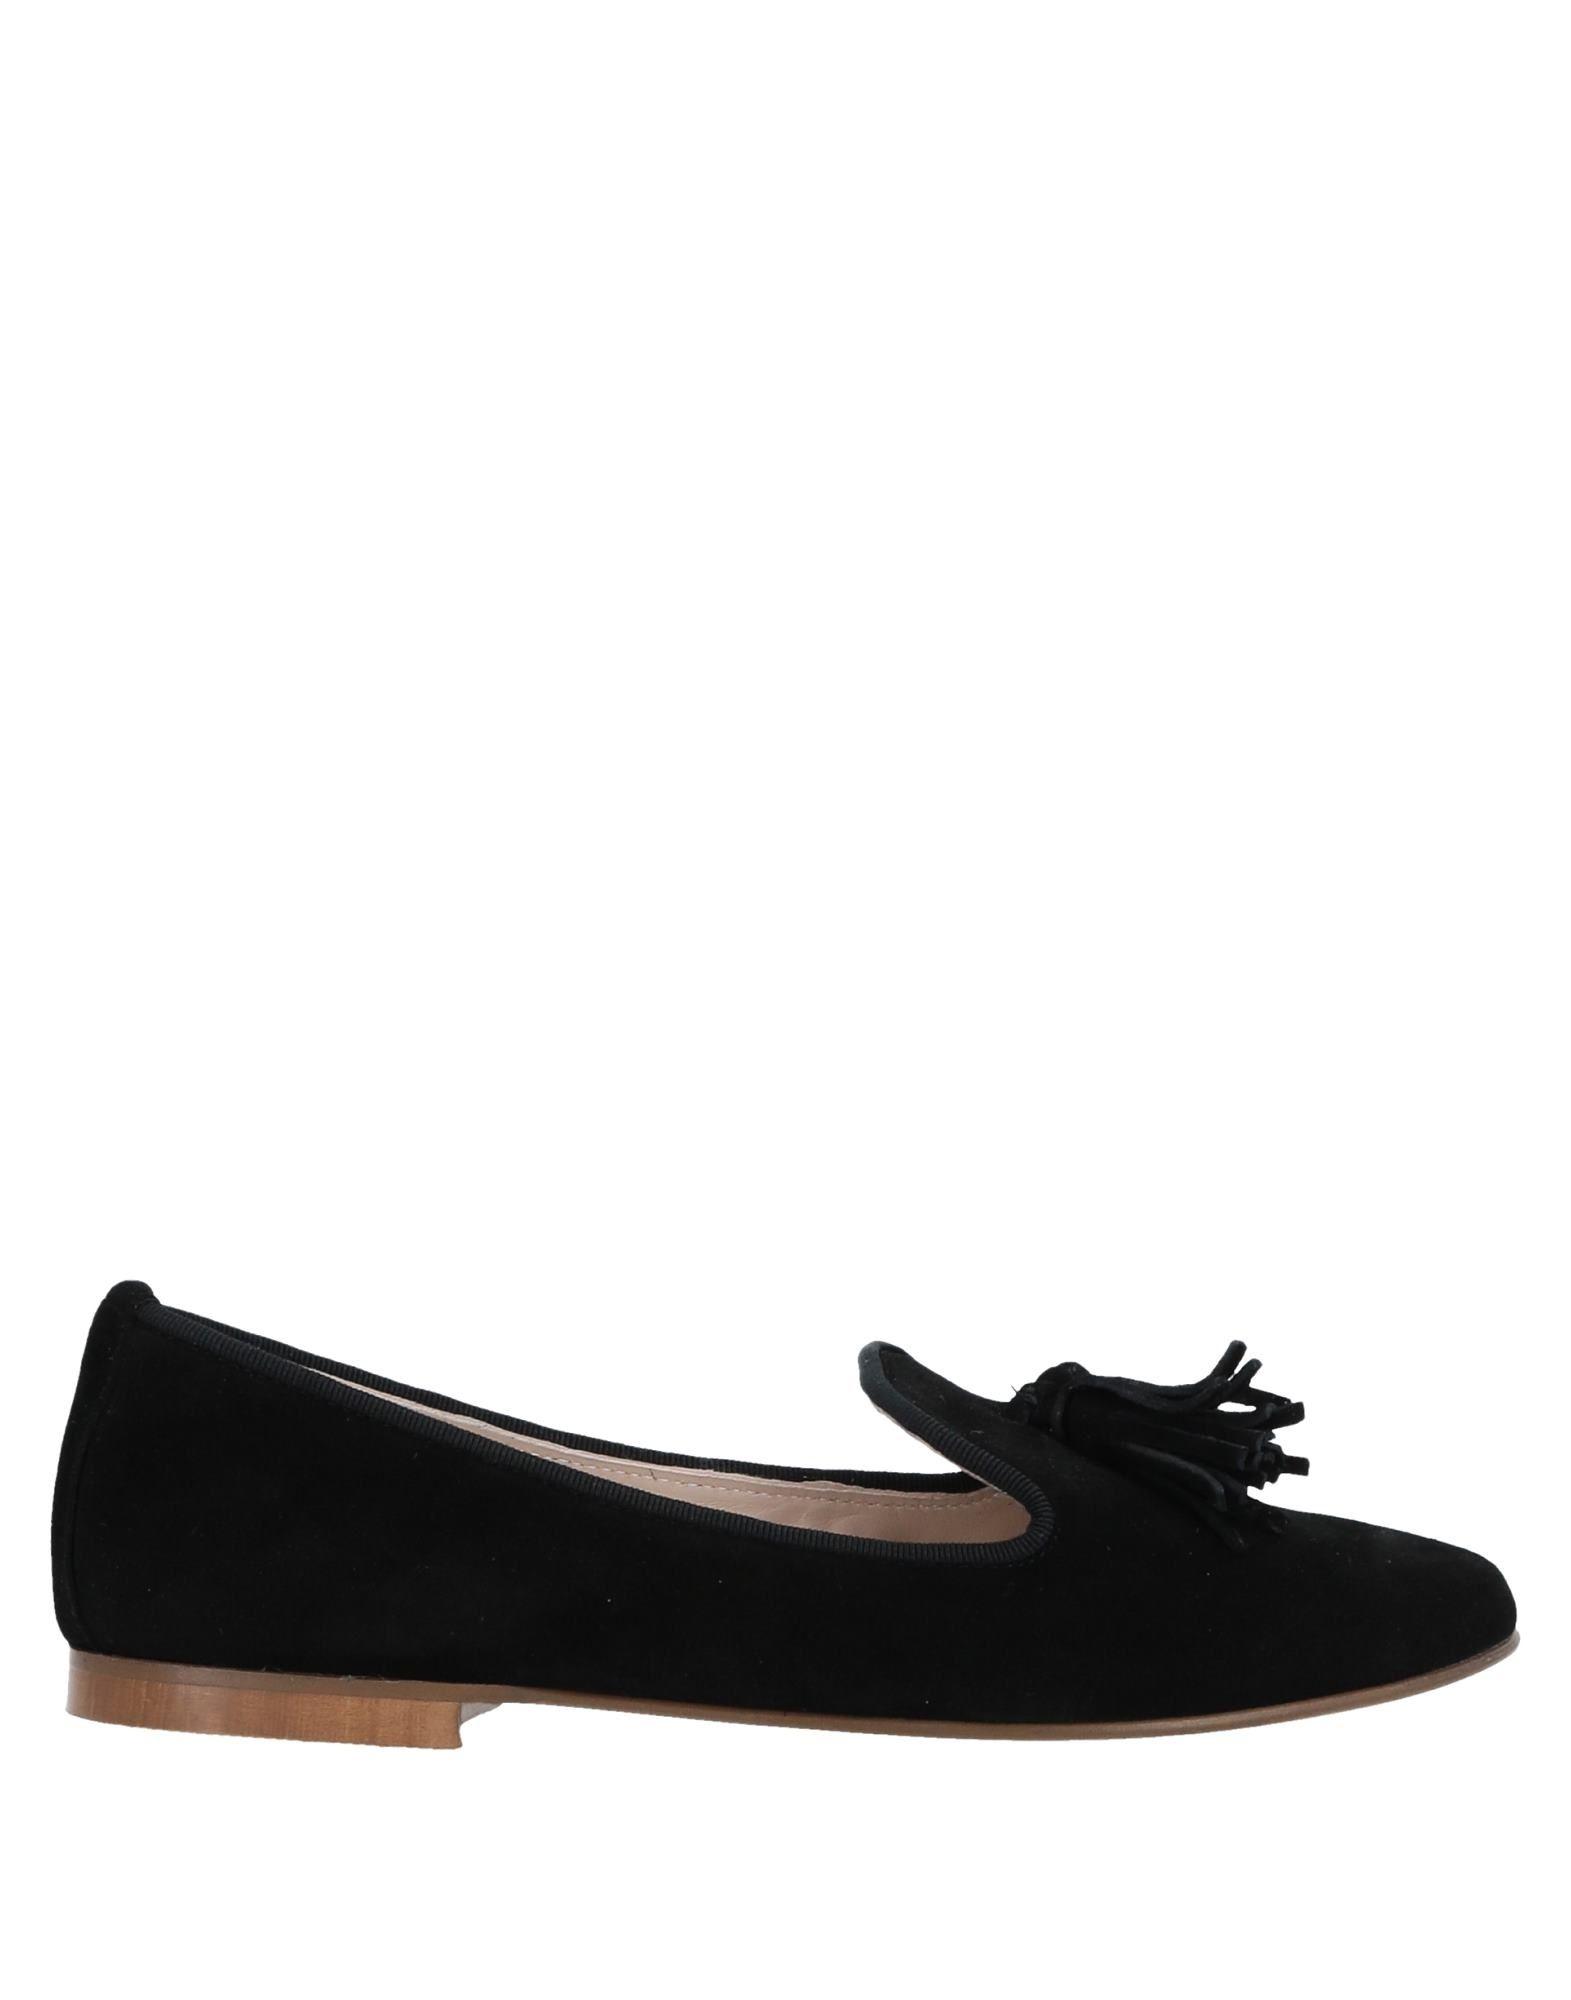 Haltbare Mode billige Schuhe Cantarelli Mokassins Damen  11516172CL Heiße Schuhe